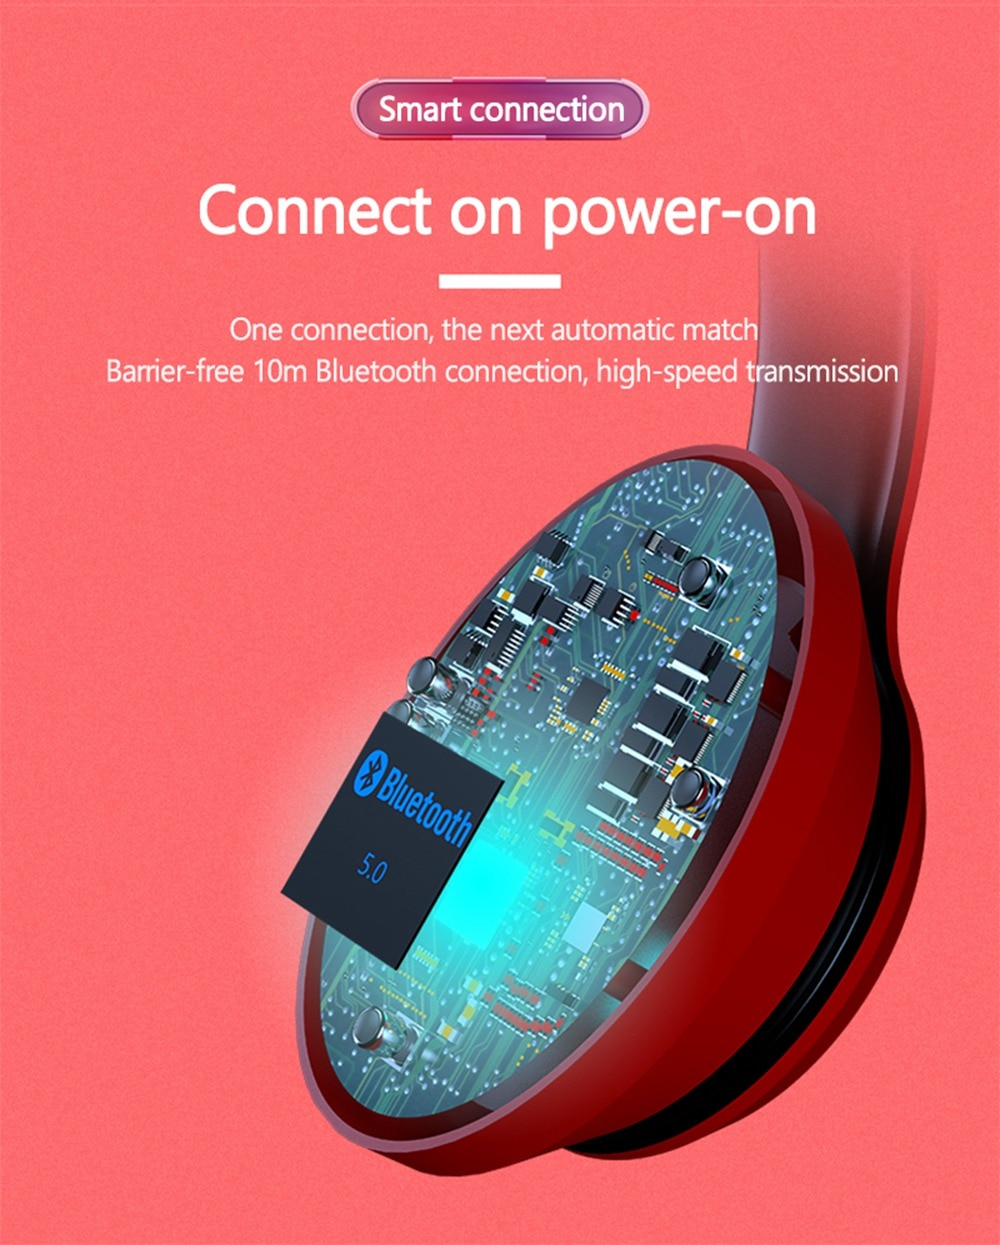 Lenovo HD200 Bluetooth Draadloze Stereo Hoofdtelefoon BT5.0 Lange Standby Leven Met Noise Cancelling Voor Xiaomi Iphone Lenovo Headset 13